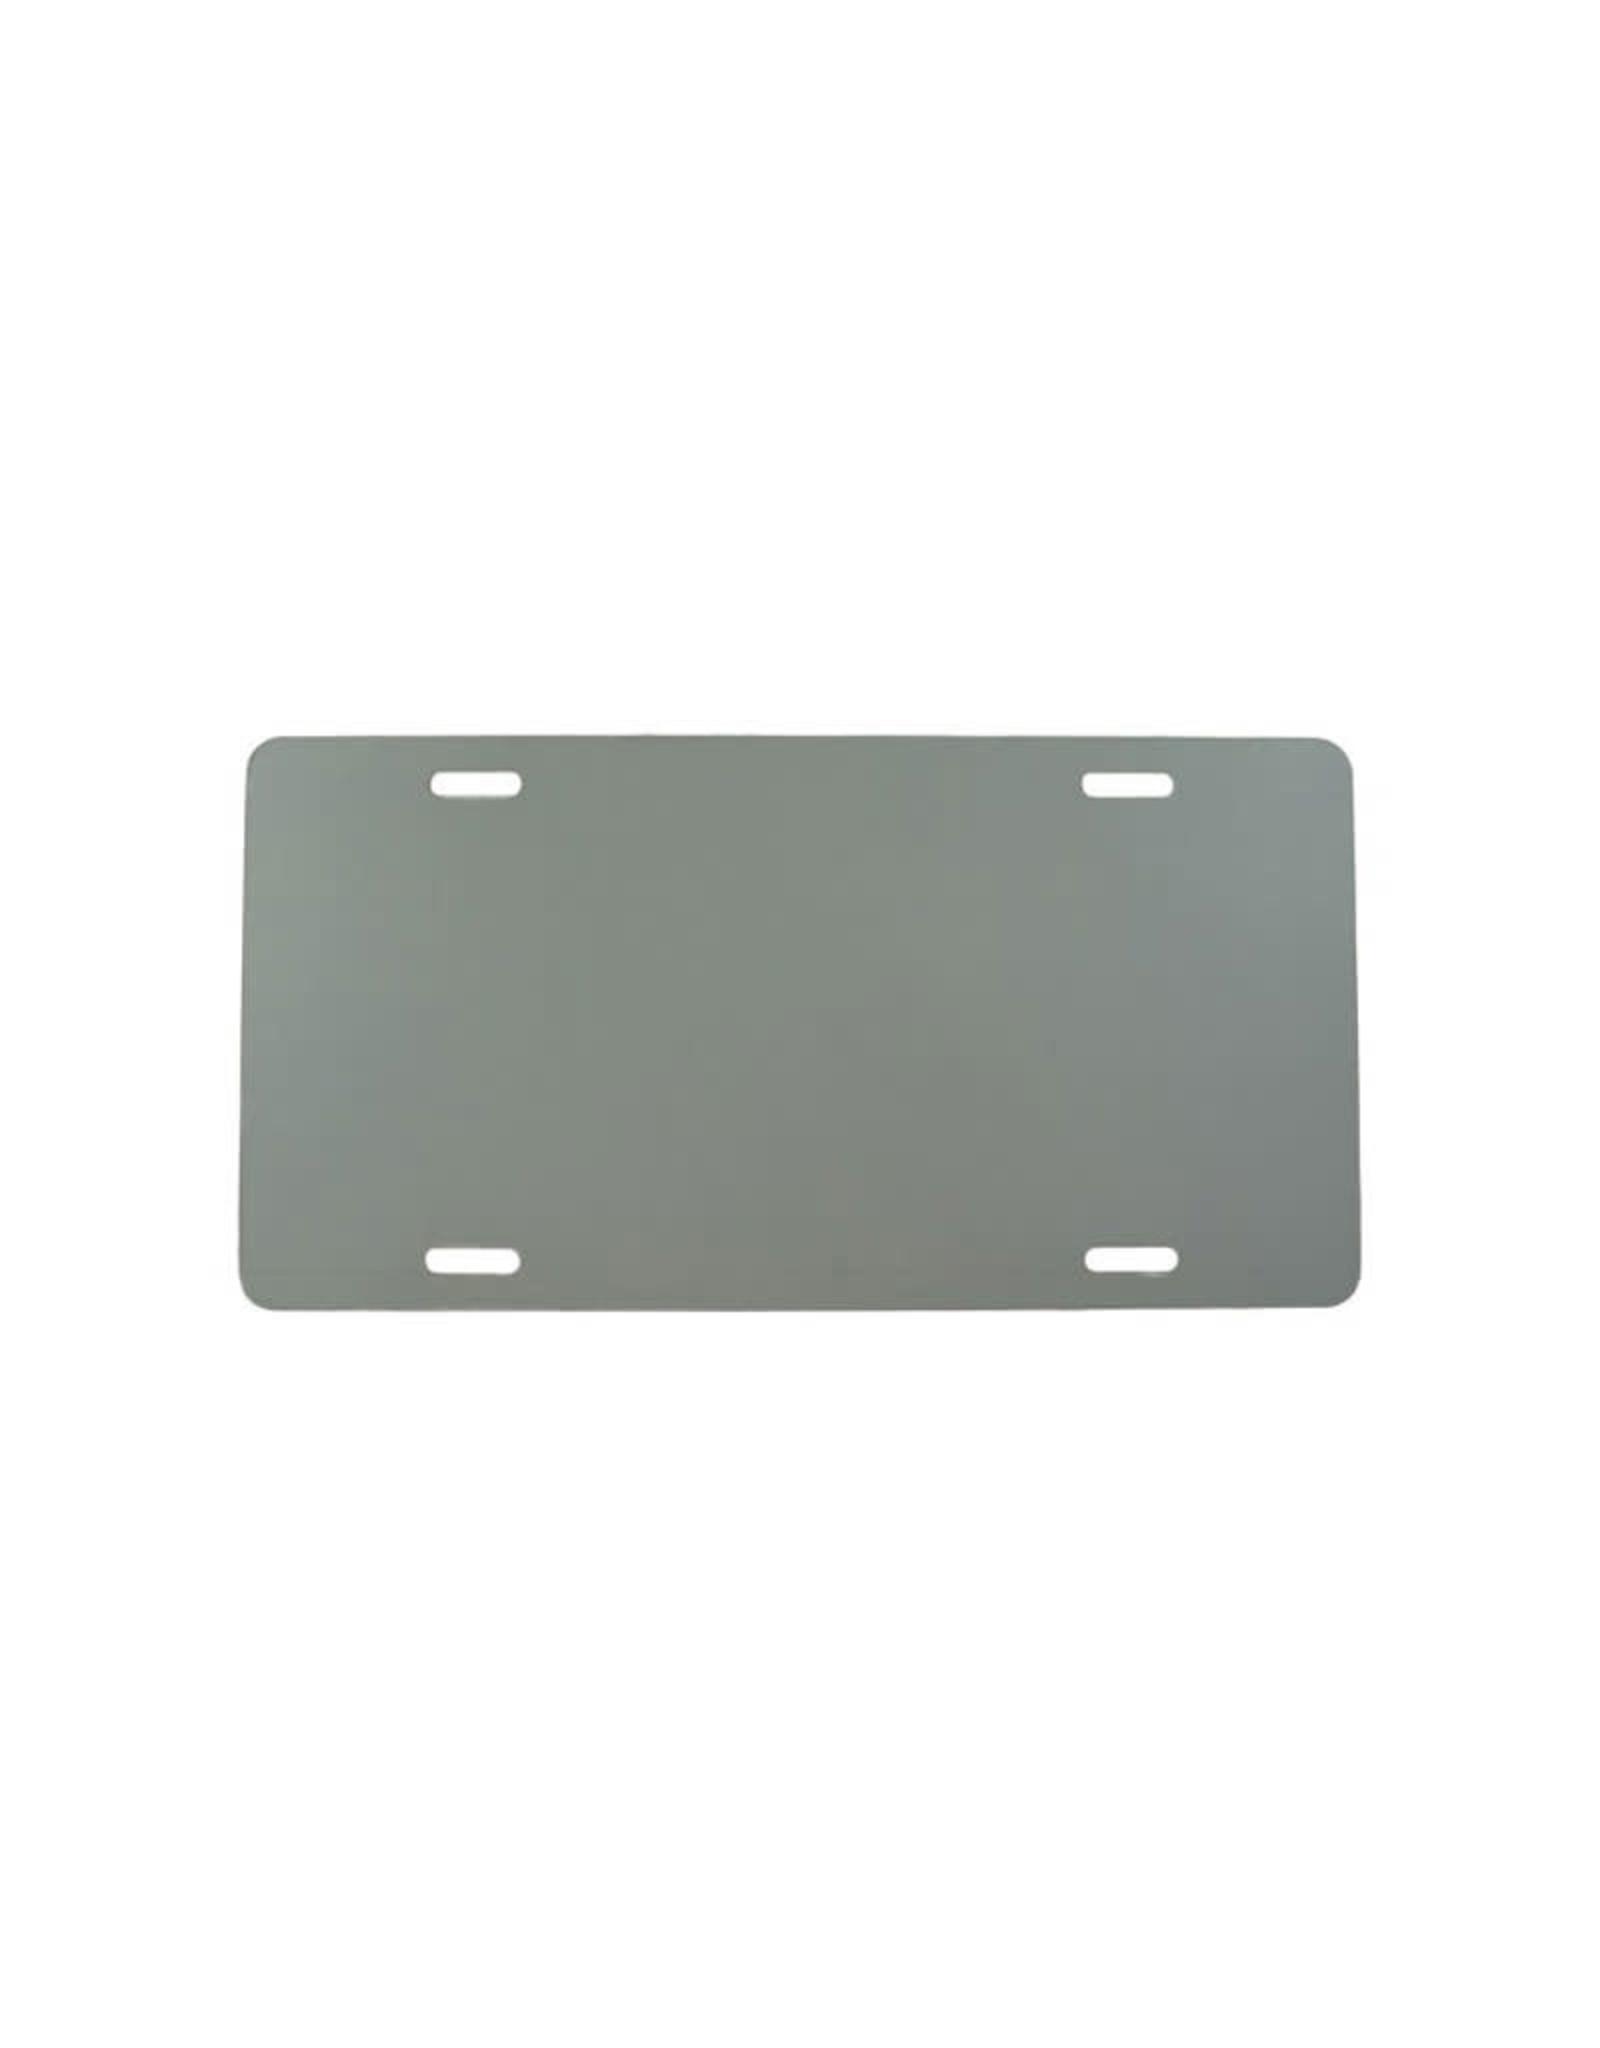 Harder & Steenbeck Harder & Steenbeck US License Plate Dimensions 30 x 15 cm